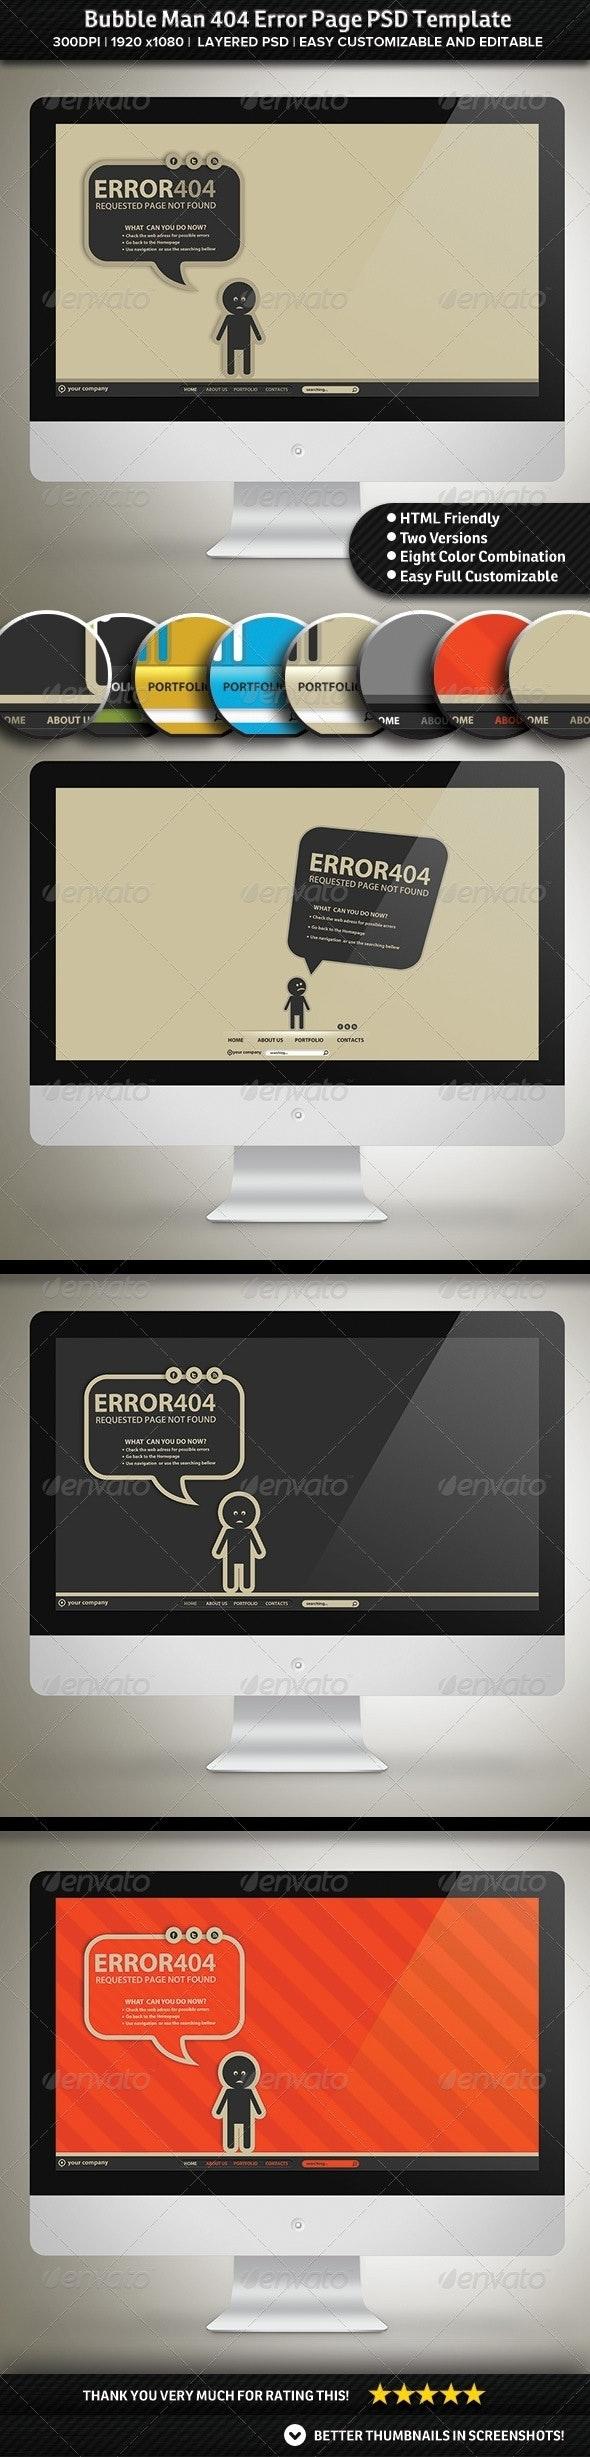 Bubble Man 404 Error Page PSD Template - 404 Pages Web Elements